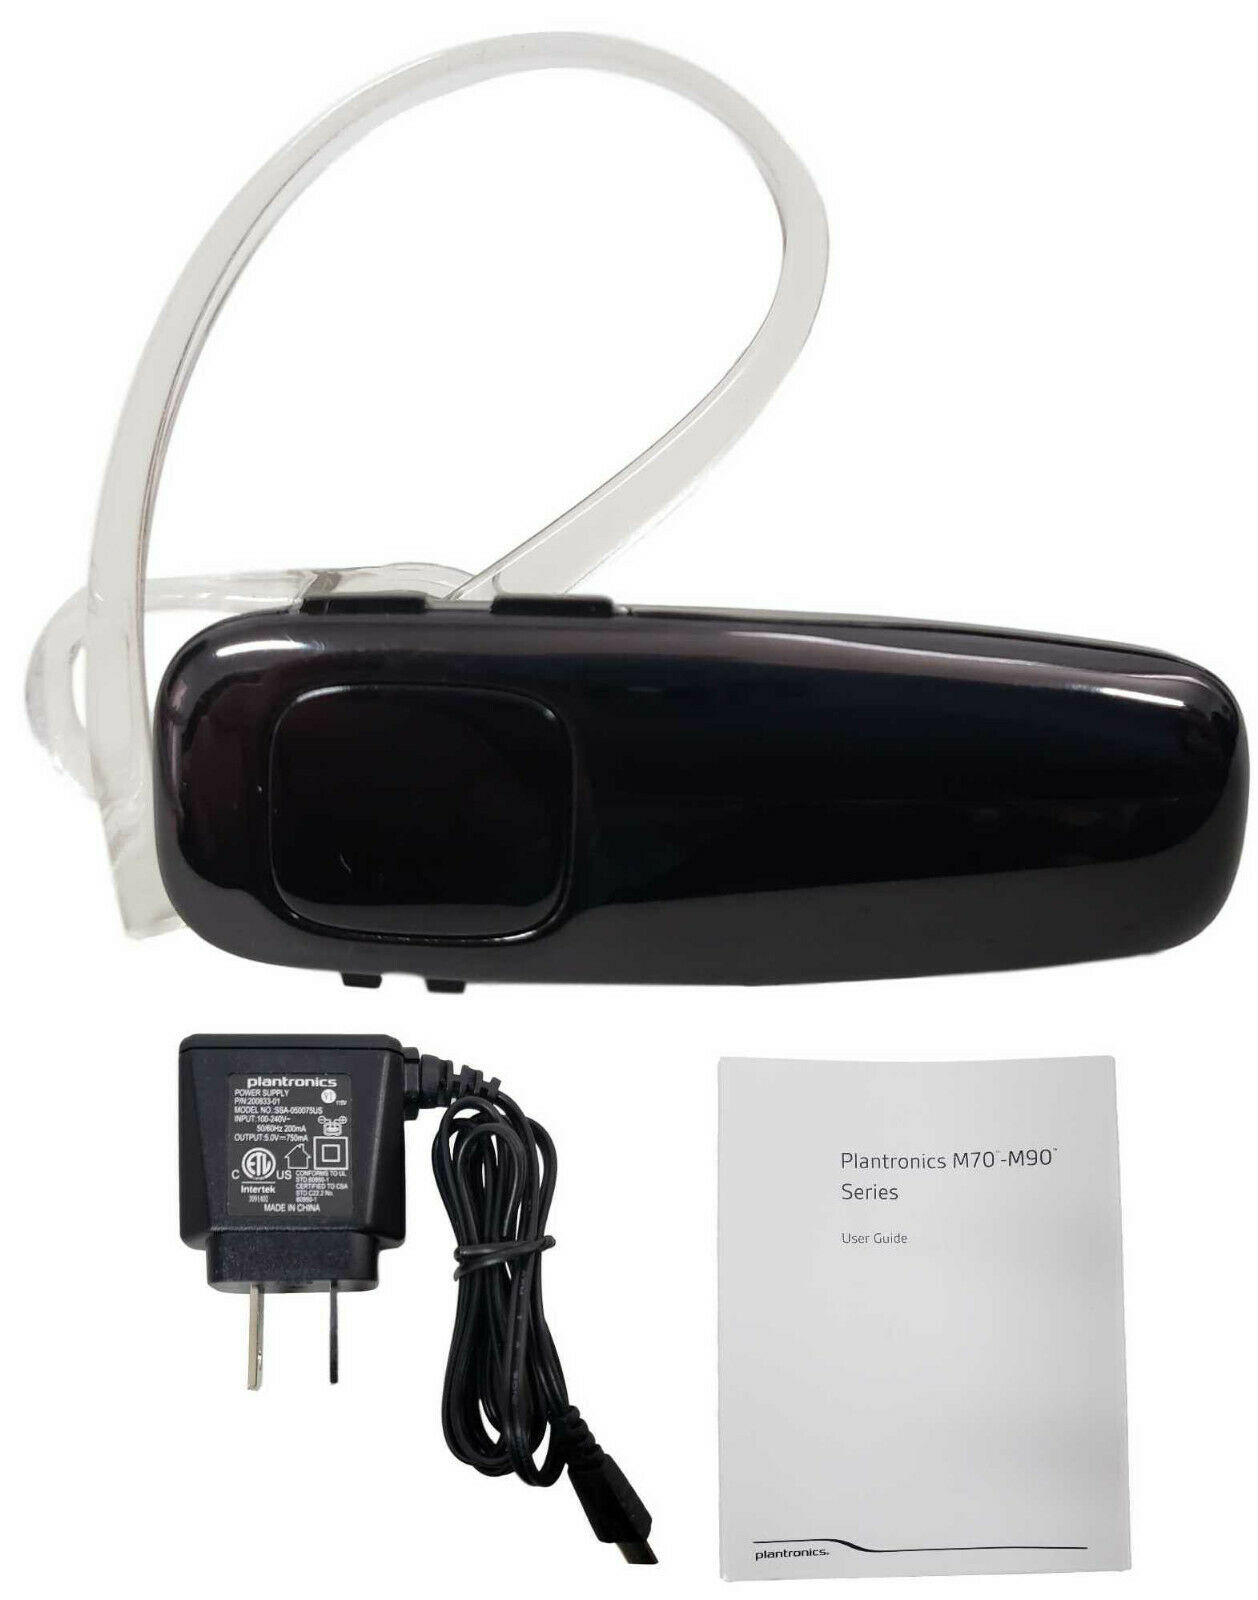 200739-05 Plantronics M70 Bluetooth Headset